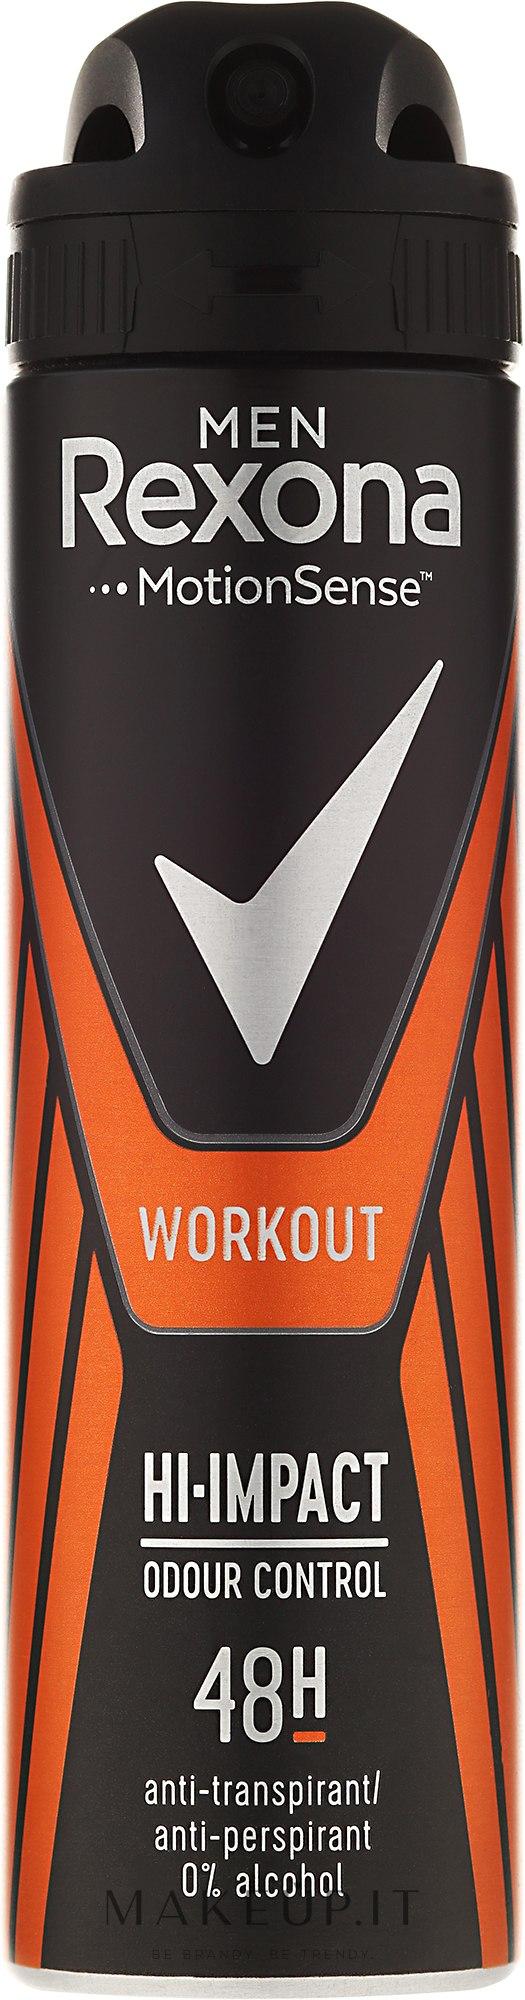 Deodorante spray - Rexona Men Motionsense Workout Hi-impact 48h Anti-perspirant — foto 150 ml